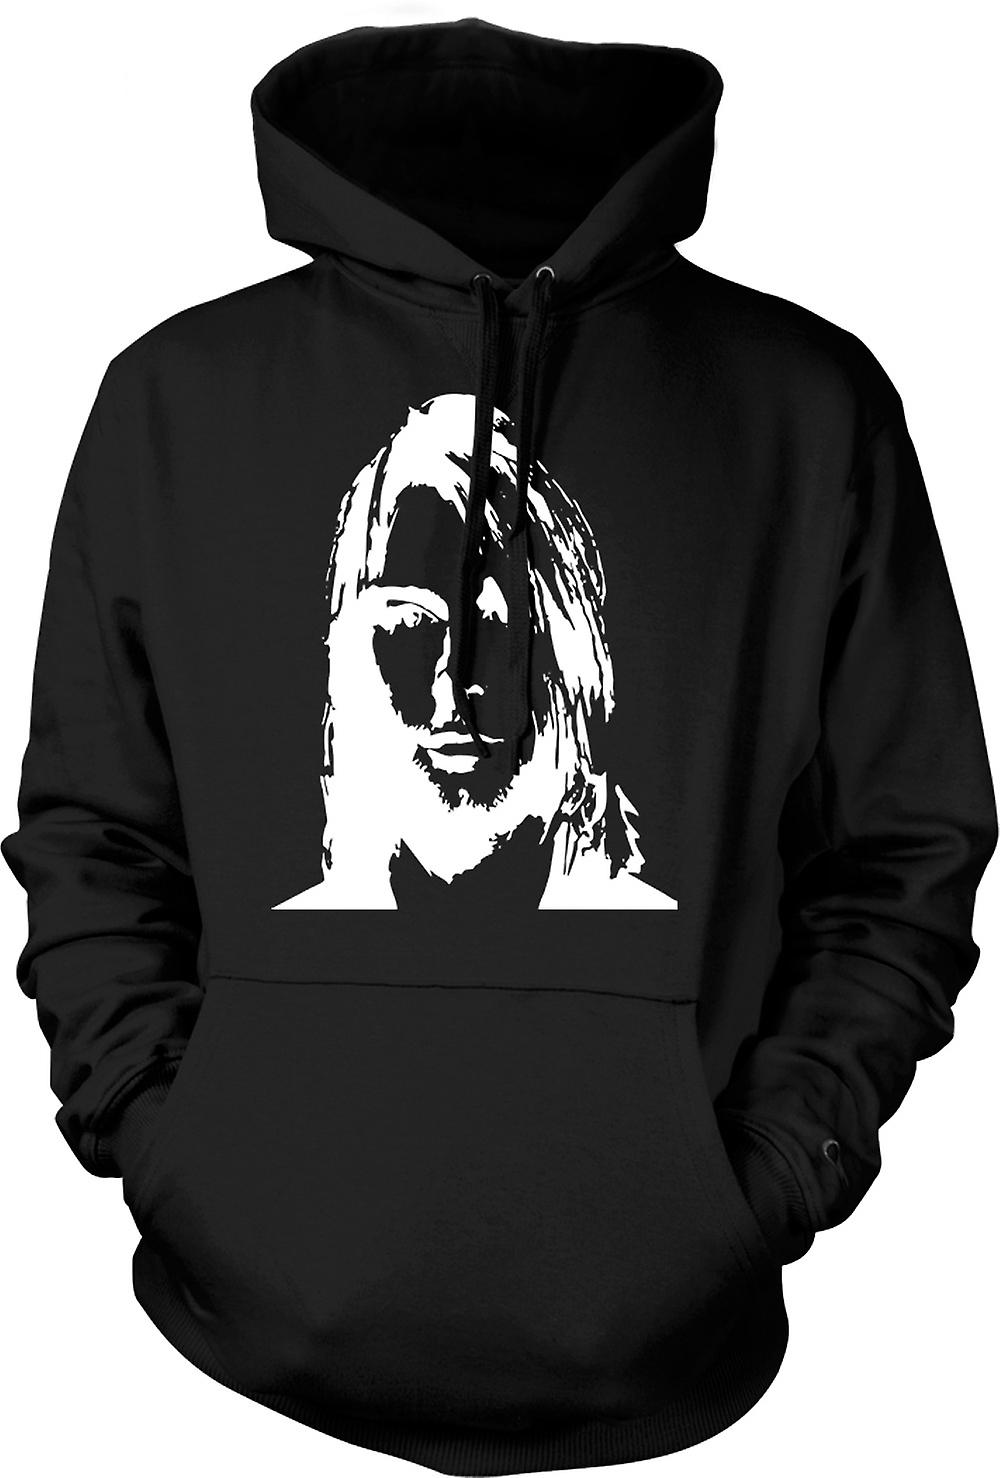 Herren Hoodie - Nirvana - Kurt Cobain - Skizze